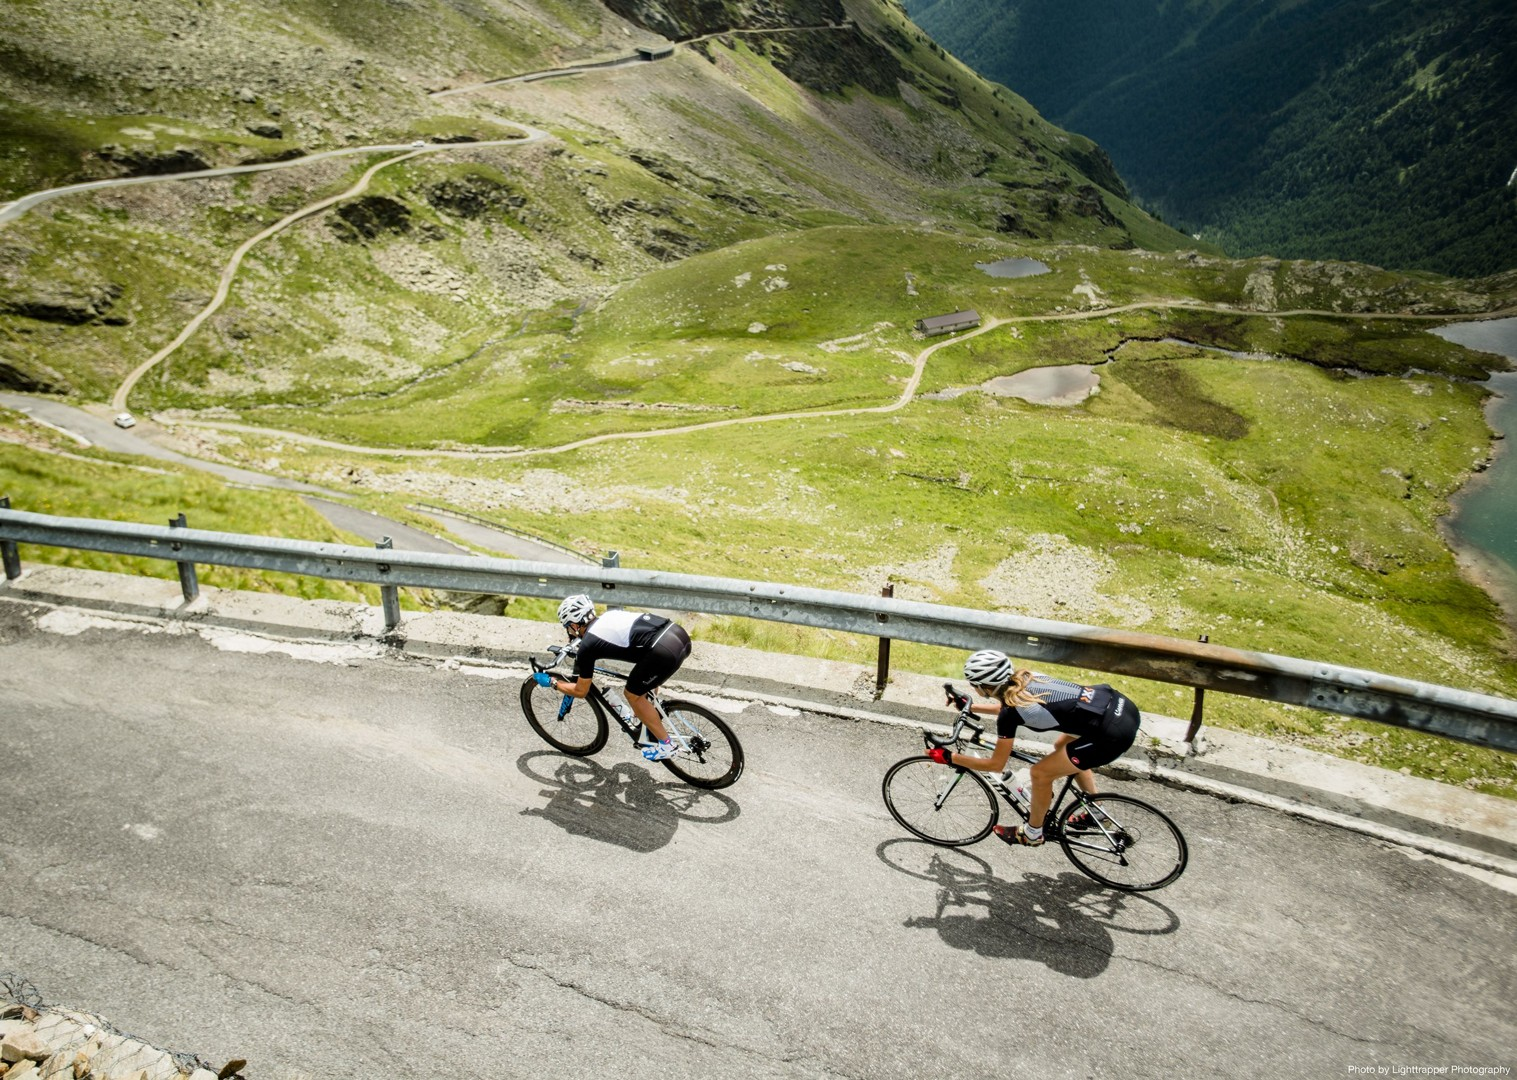 mortirolo-guided-road-cycling-holiday.jpg - Italy - Italian Alps Introduction - Guided Road Cycling Holiday - Italia Road Cycling